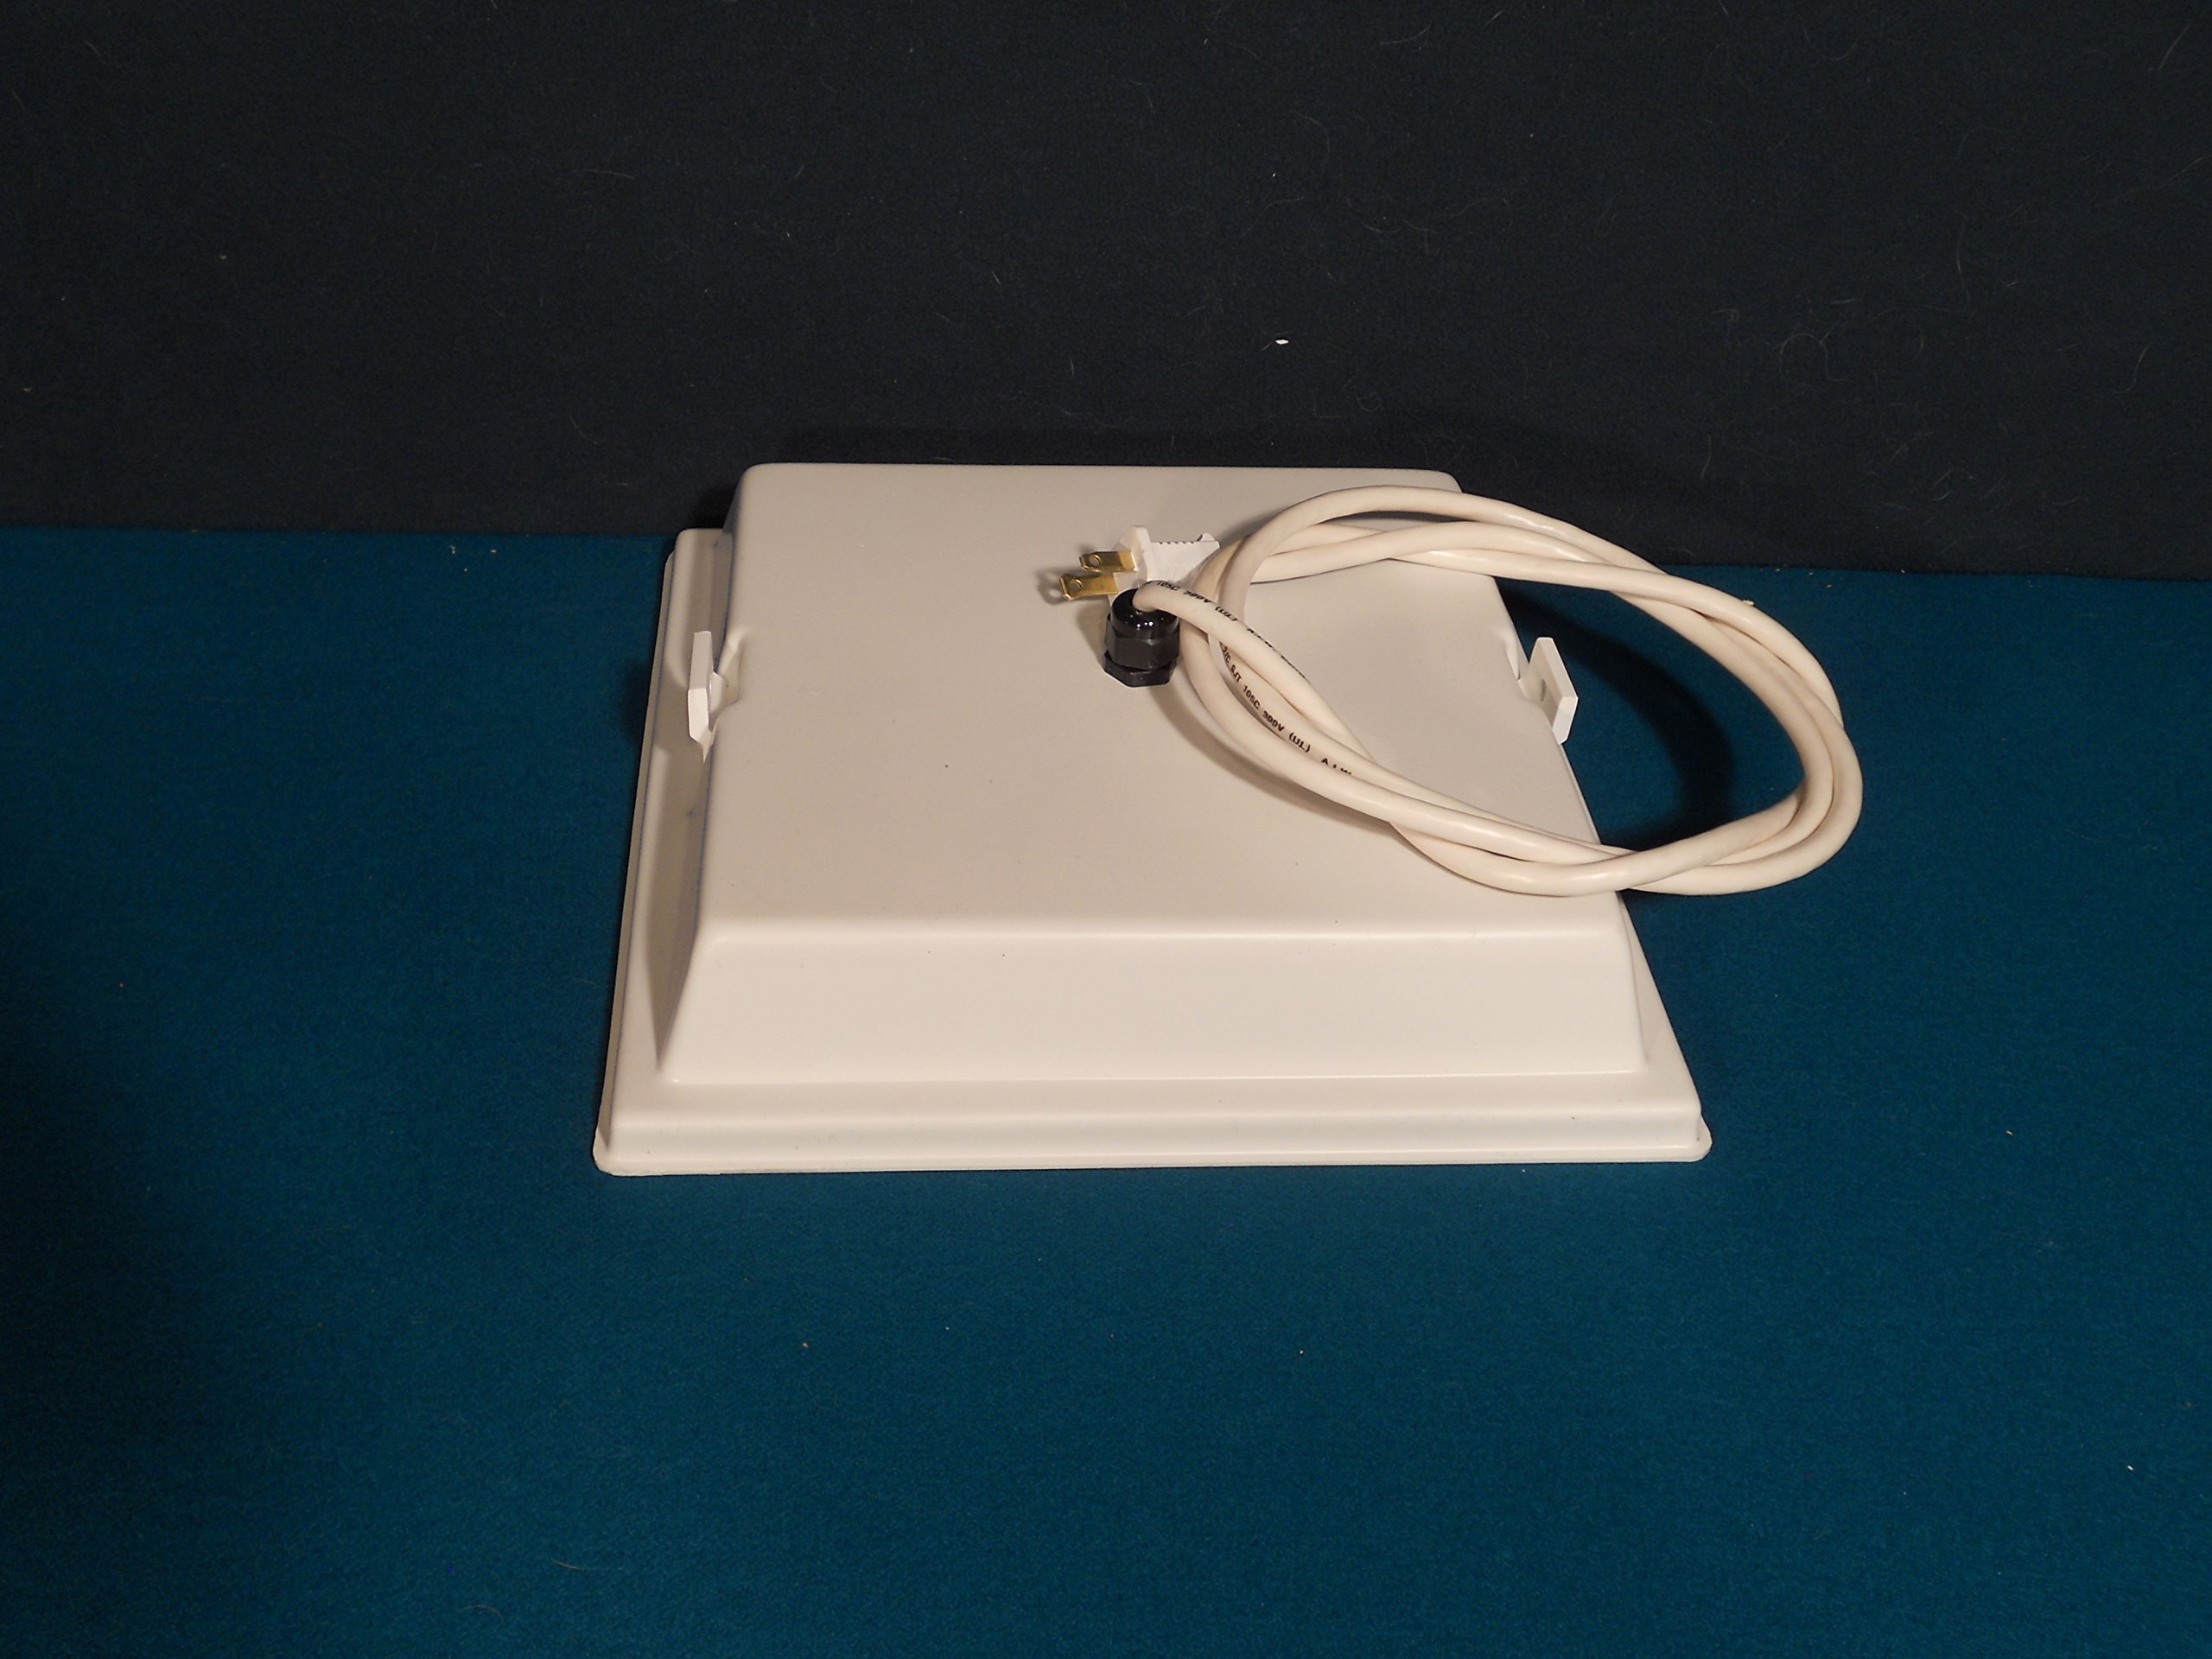 SWEETER HEATER Infrared Heater for Chicks & Pets, Overhead 11x11, 32 Watt by SWEETER HEATER